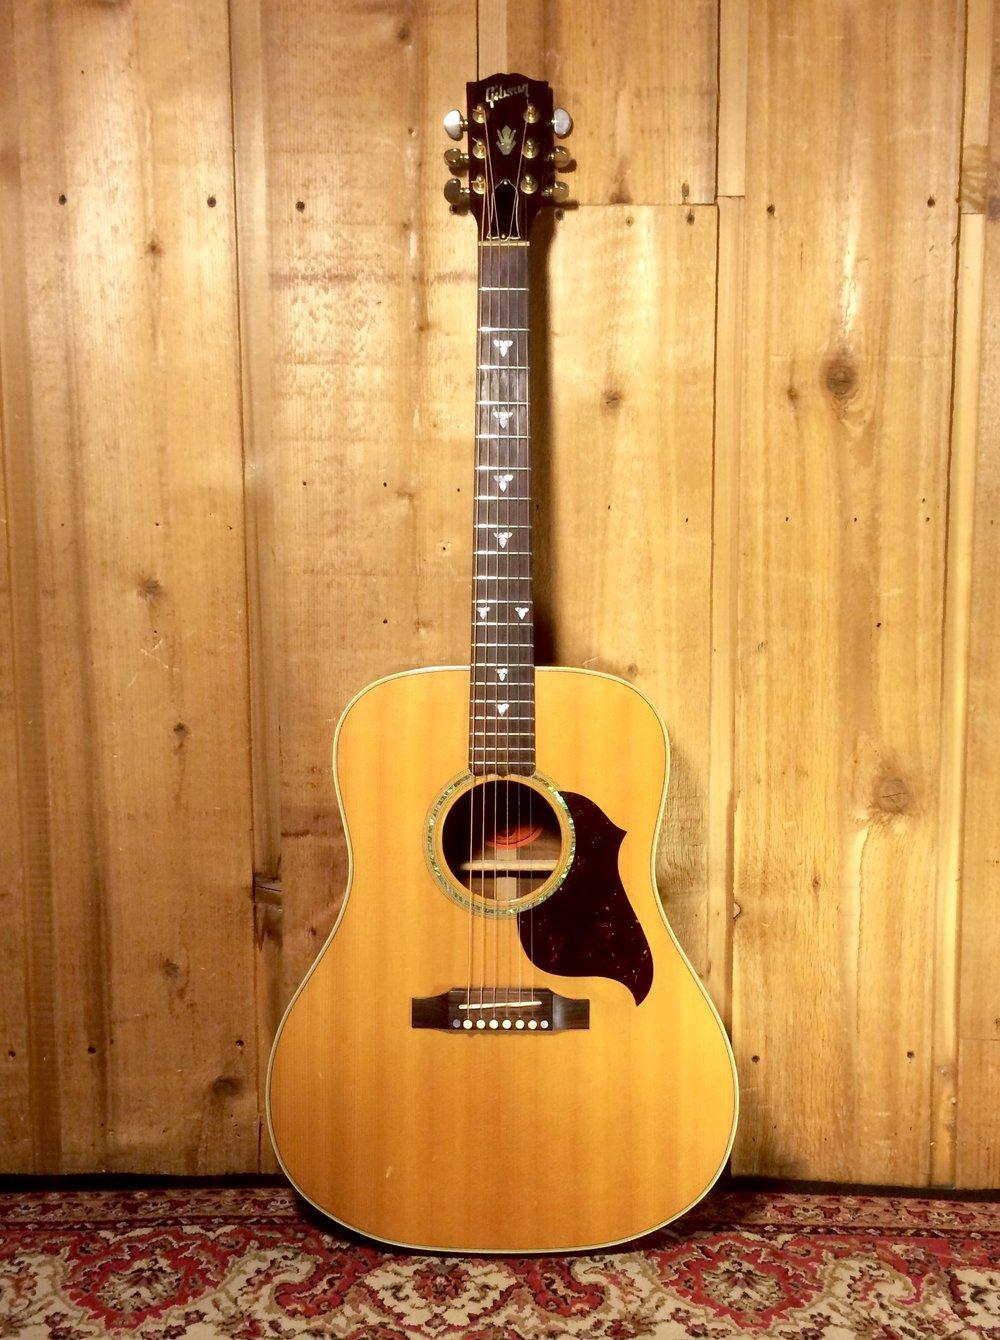 Gibson Songbird Acoustic